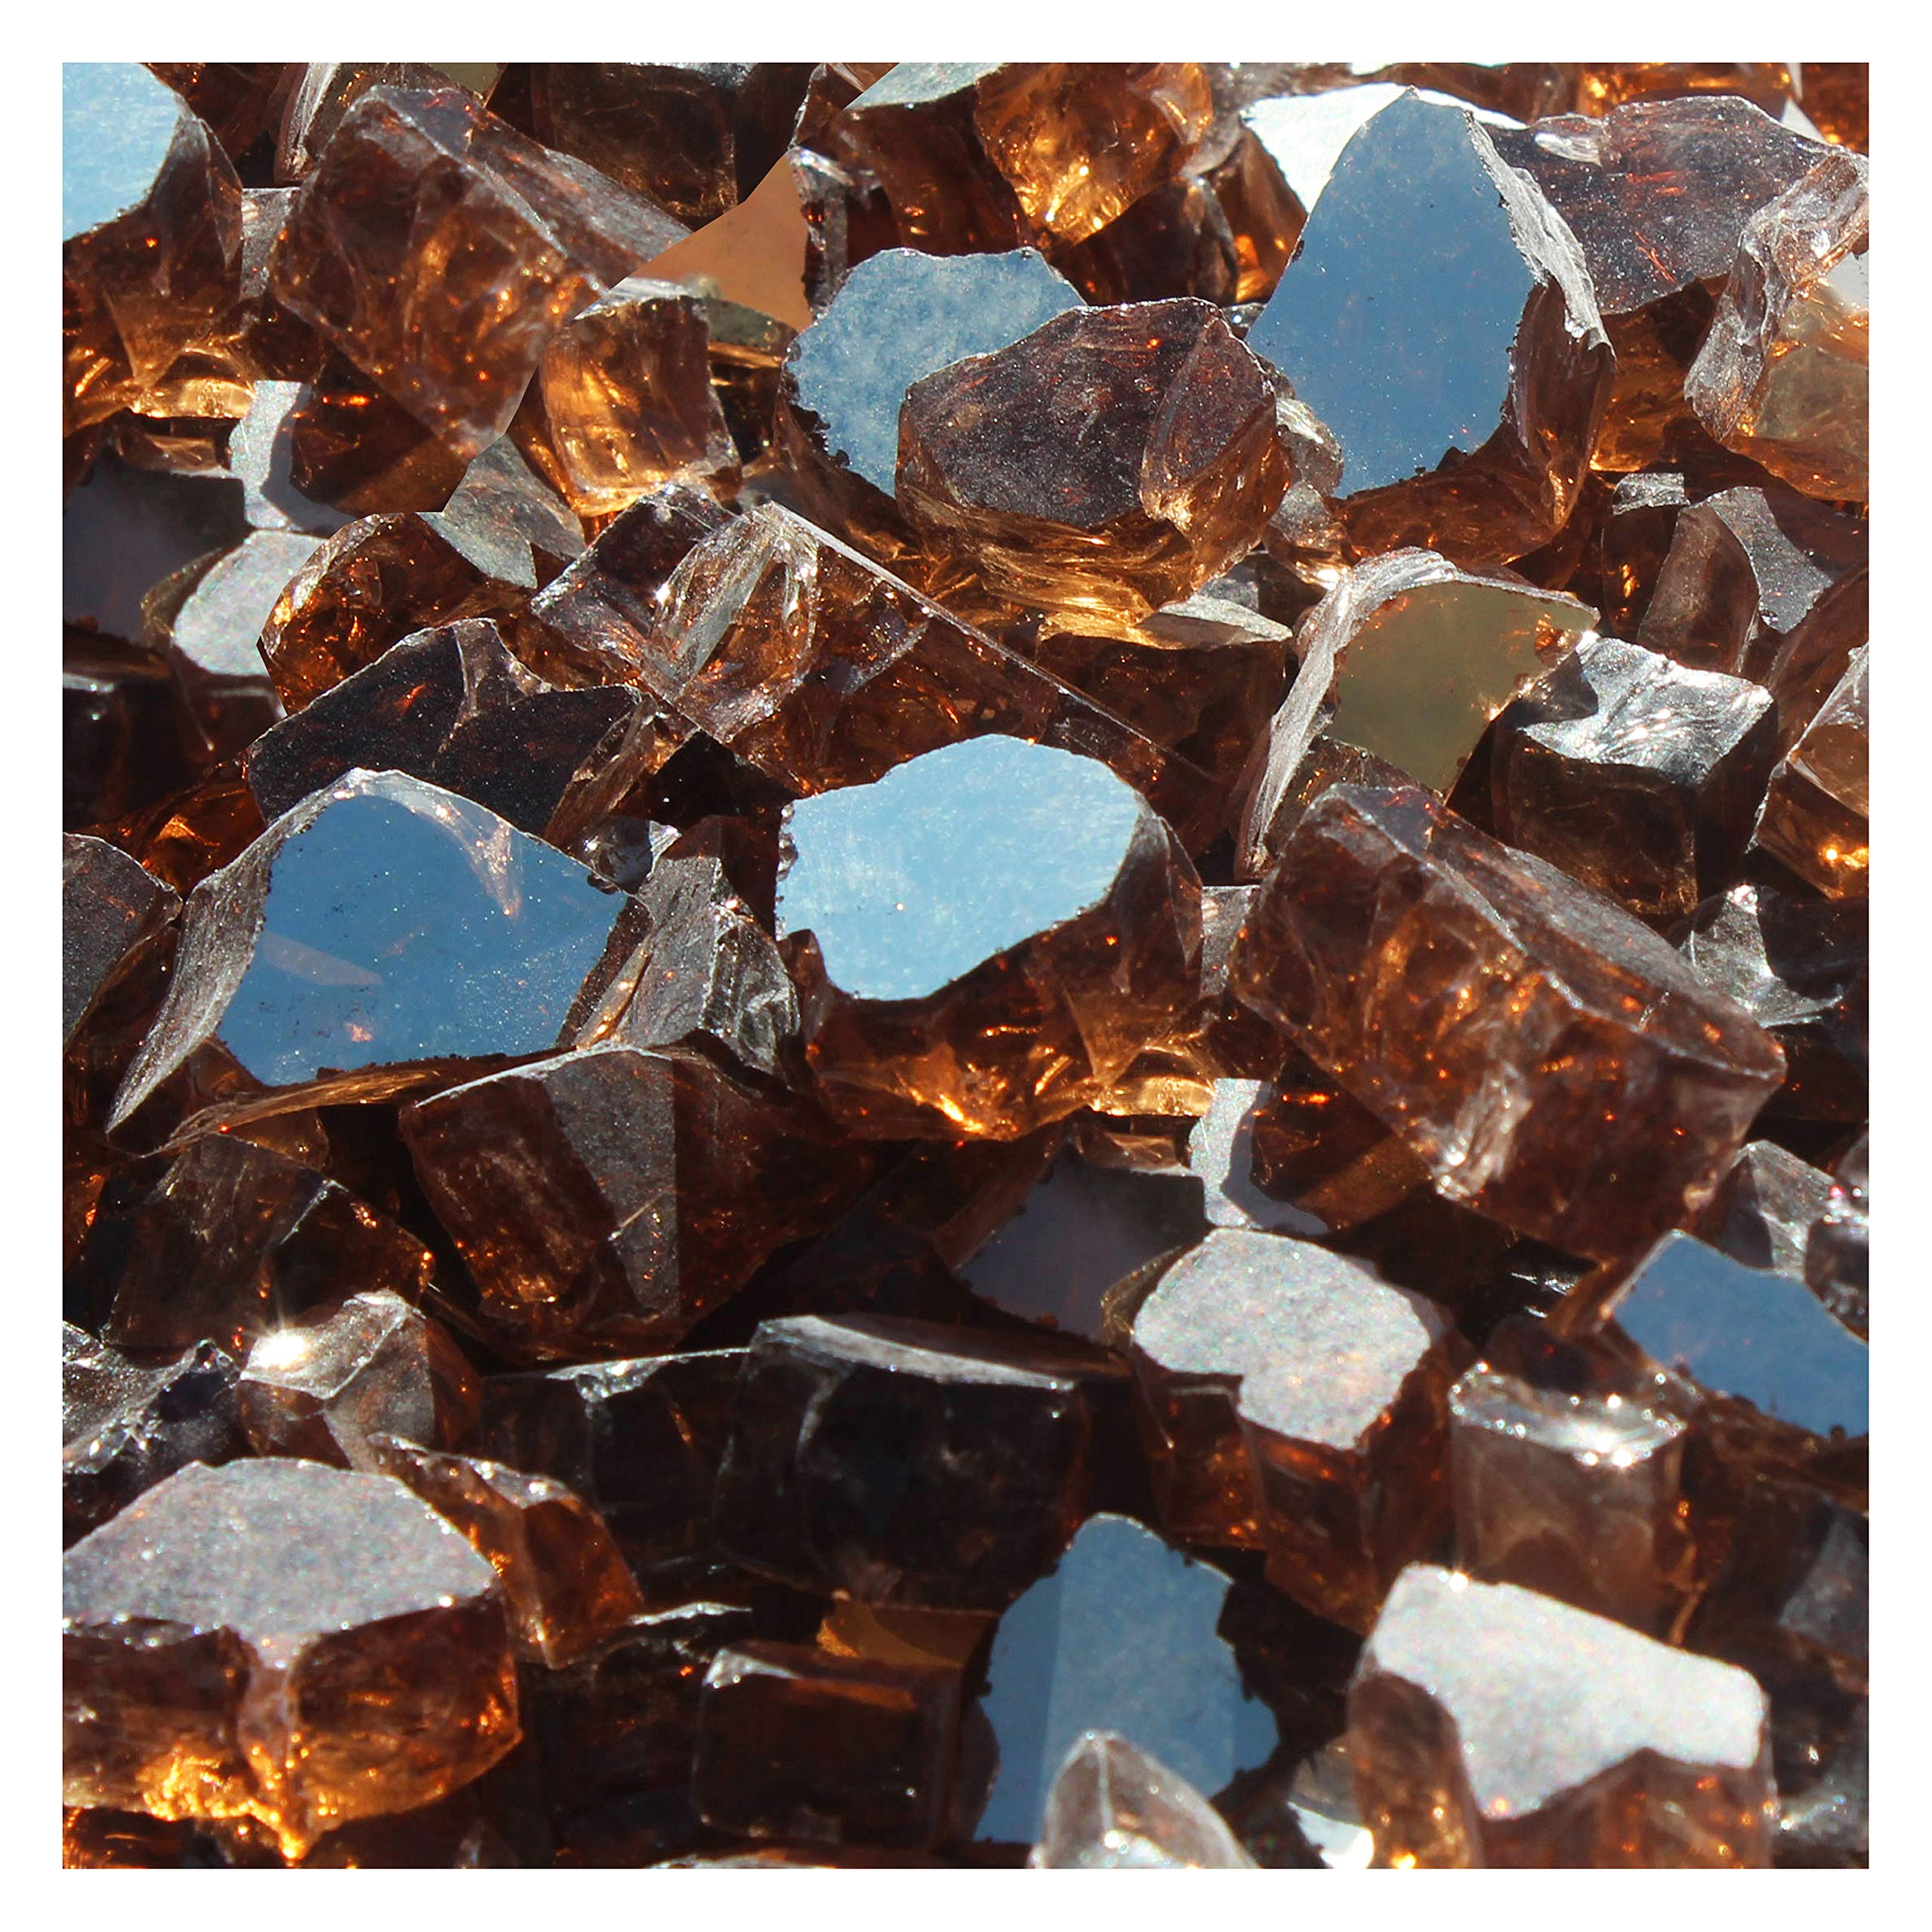 Blue Ridge Brand&Trade; Copper Reflective Fire Glass - 50-Pound Professional Grade Fire Pit Glass - 1/2'' Reflective Fire Pit Glass Bulk Contractor Pack by Blue Ridge Brand